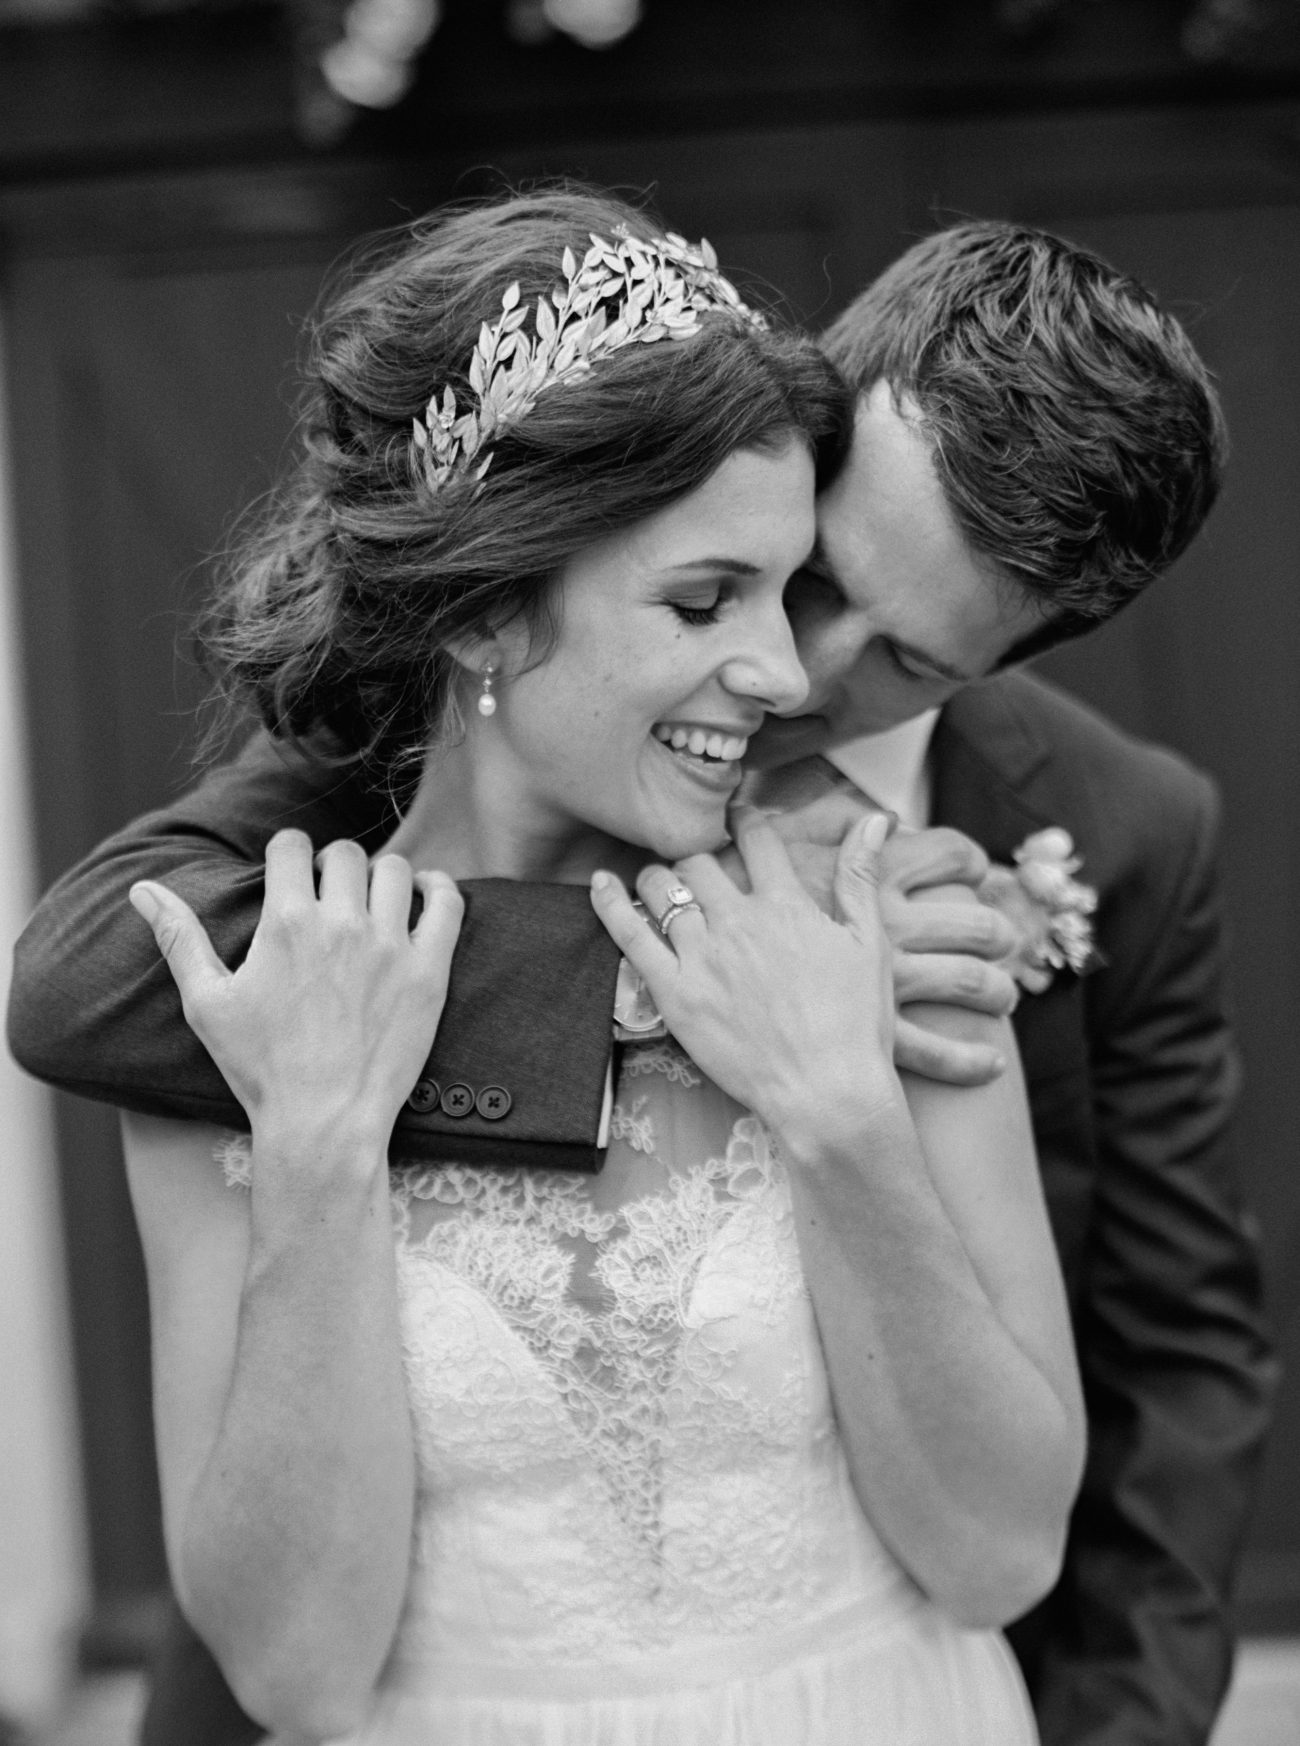 Descubre en el blog de bodas wedding ideas cinco consejos para triunfar en tu boda con sls dance